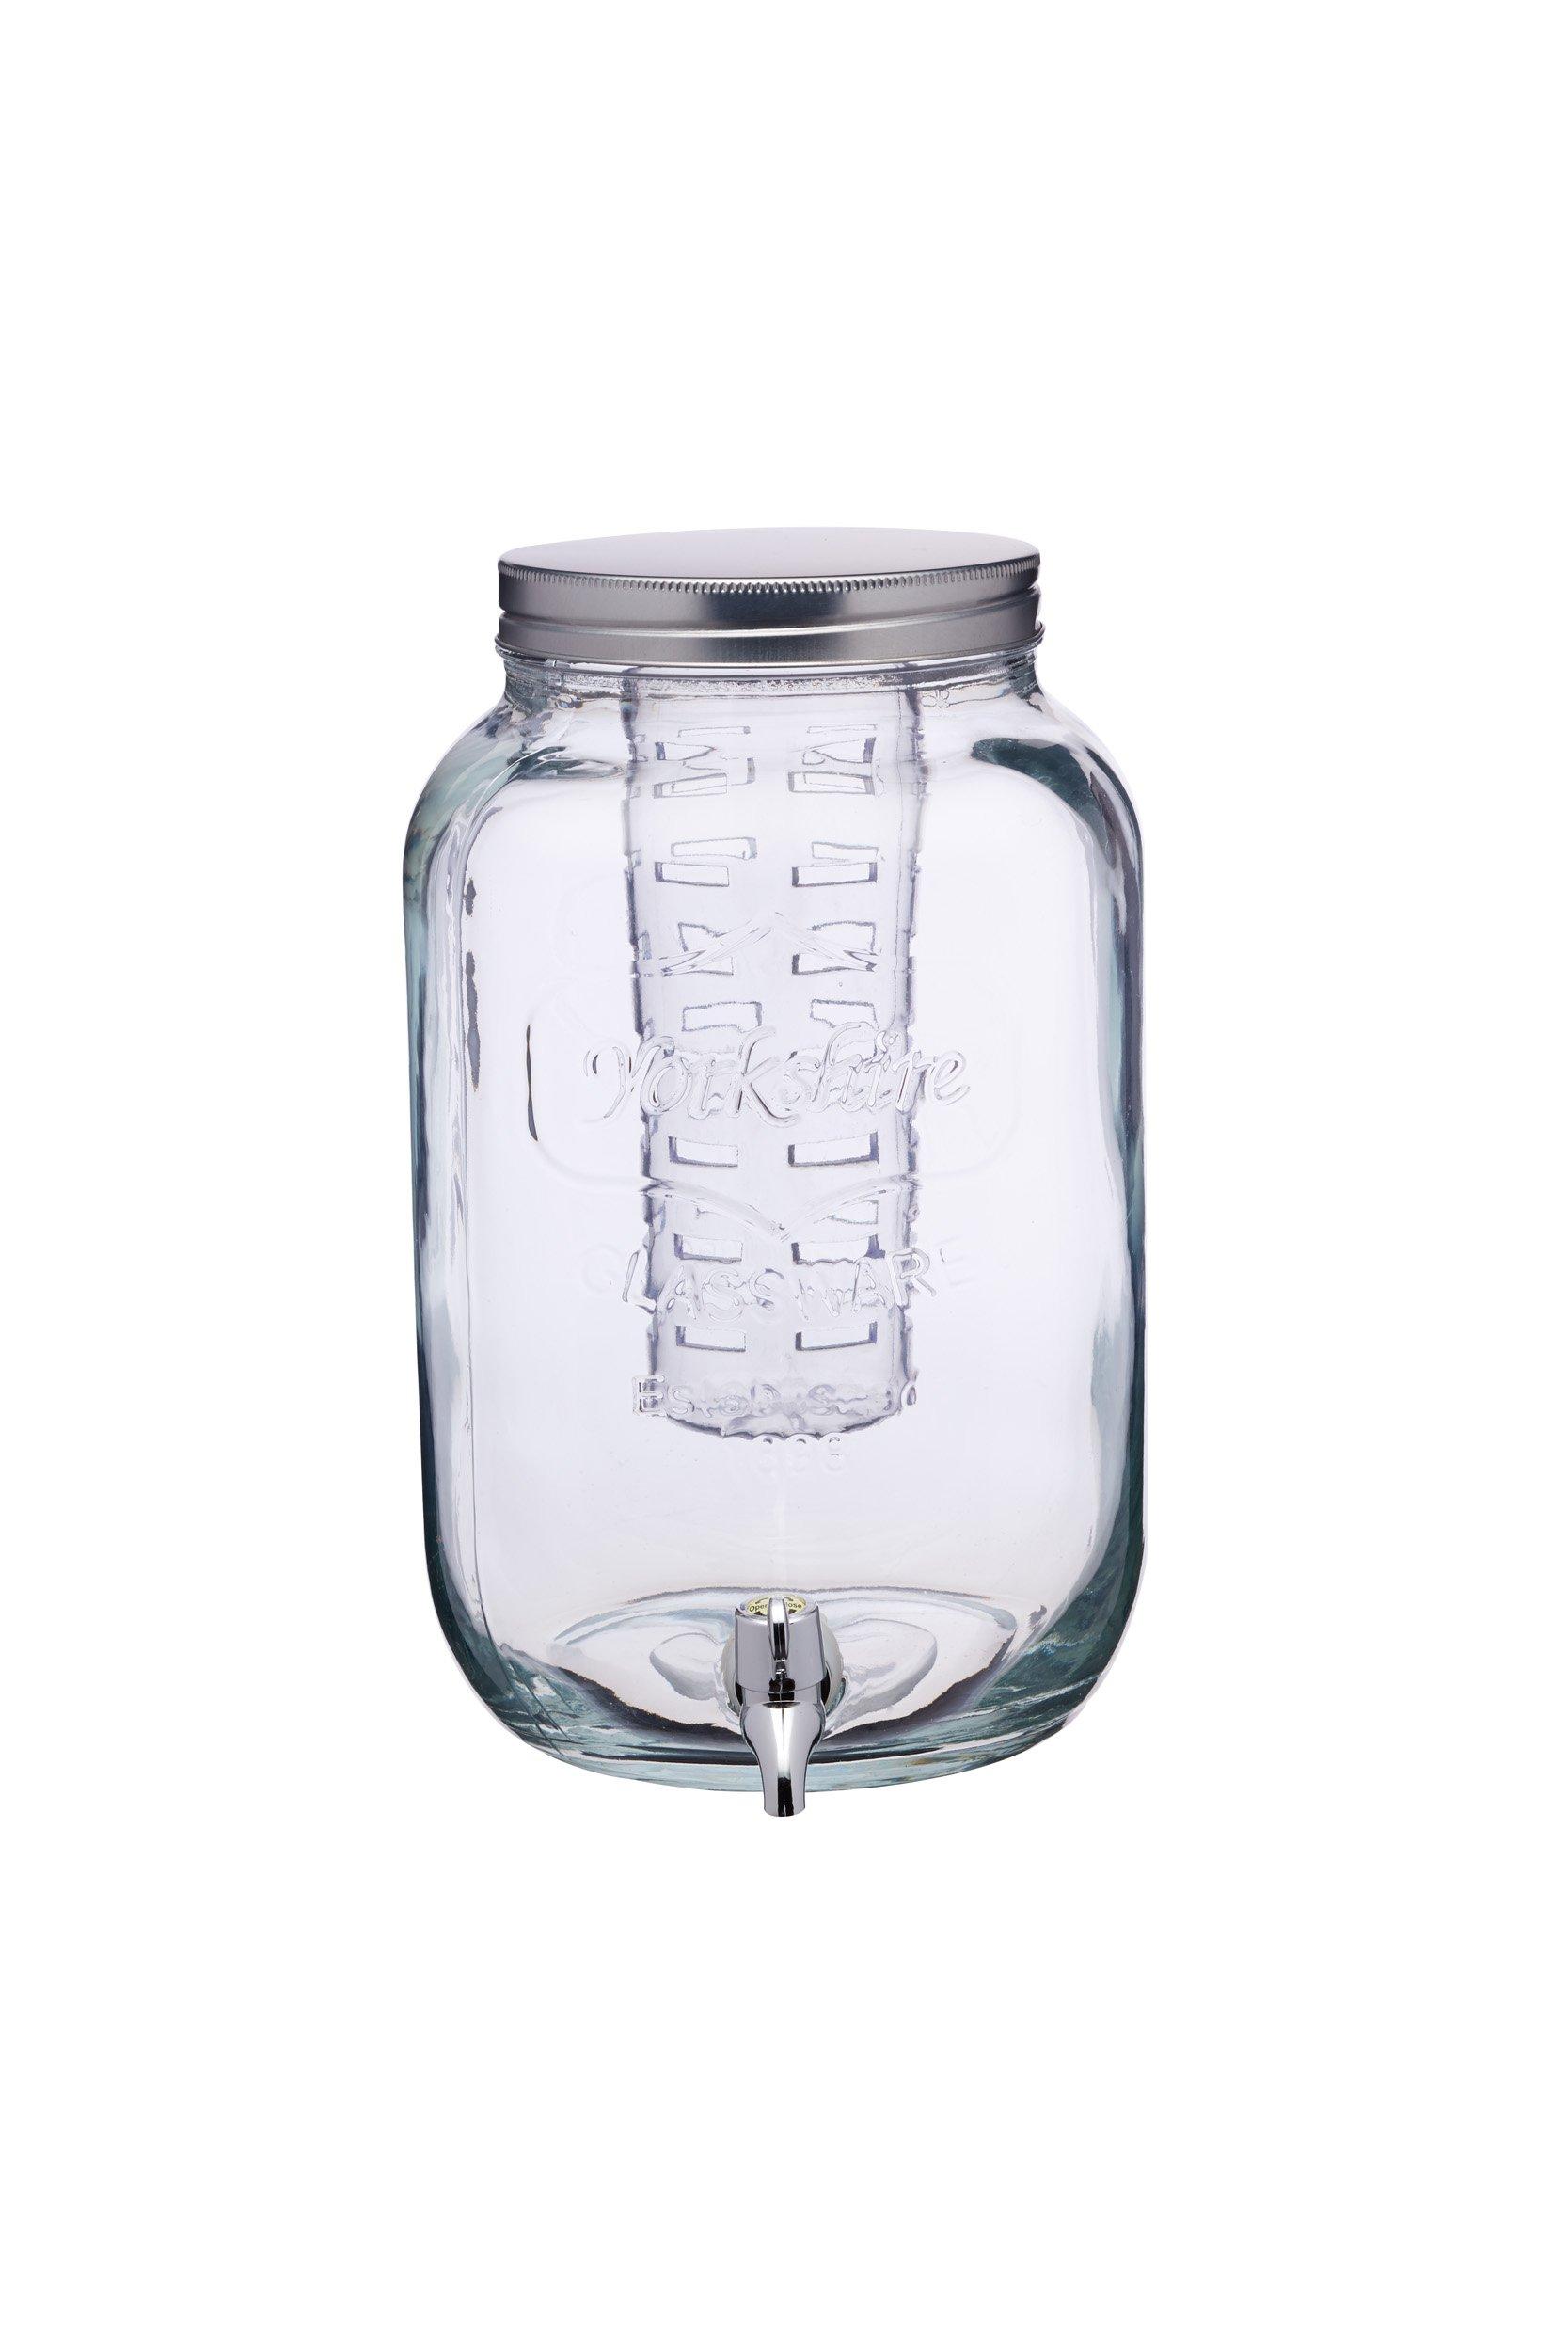 Kitchen Craft Home Made – Tarro de Cristal dispensador de Bebidas con infusor de Agua, 7,5 litros, Transparente: Amazon.es: Hogar